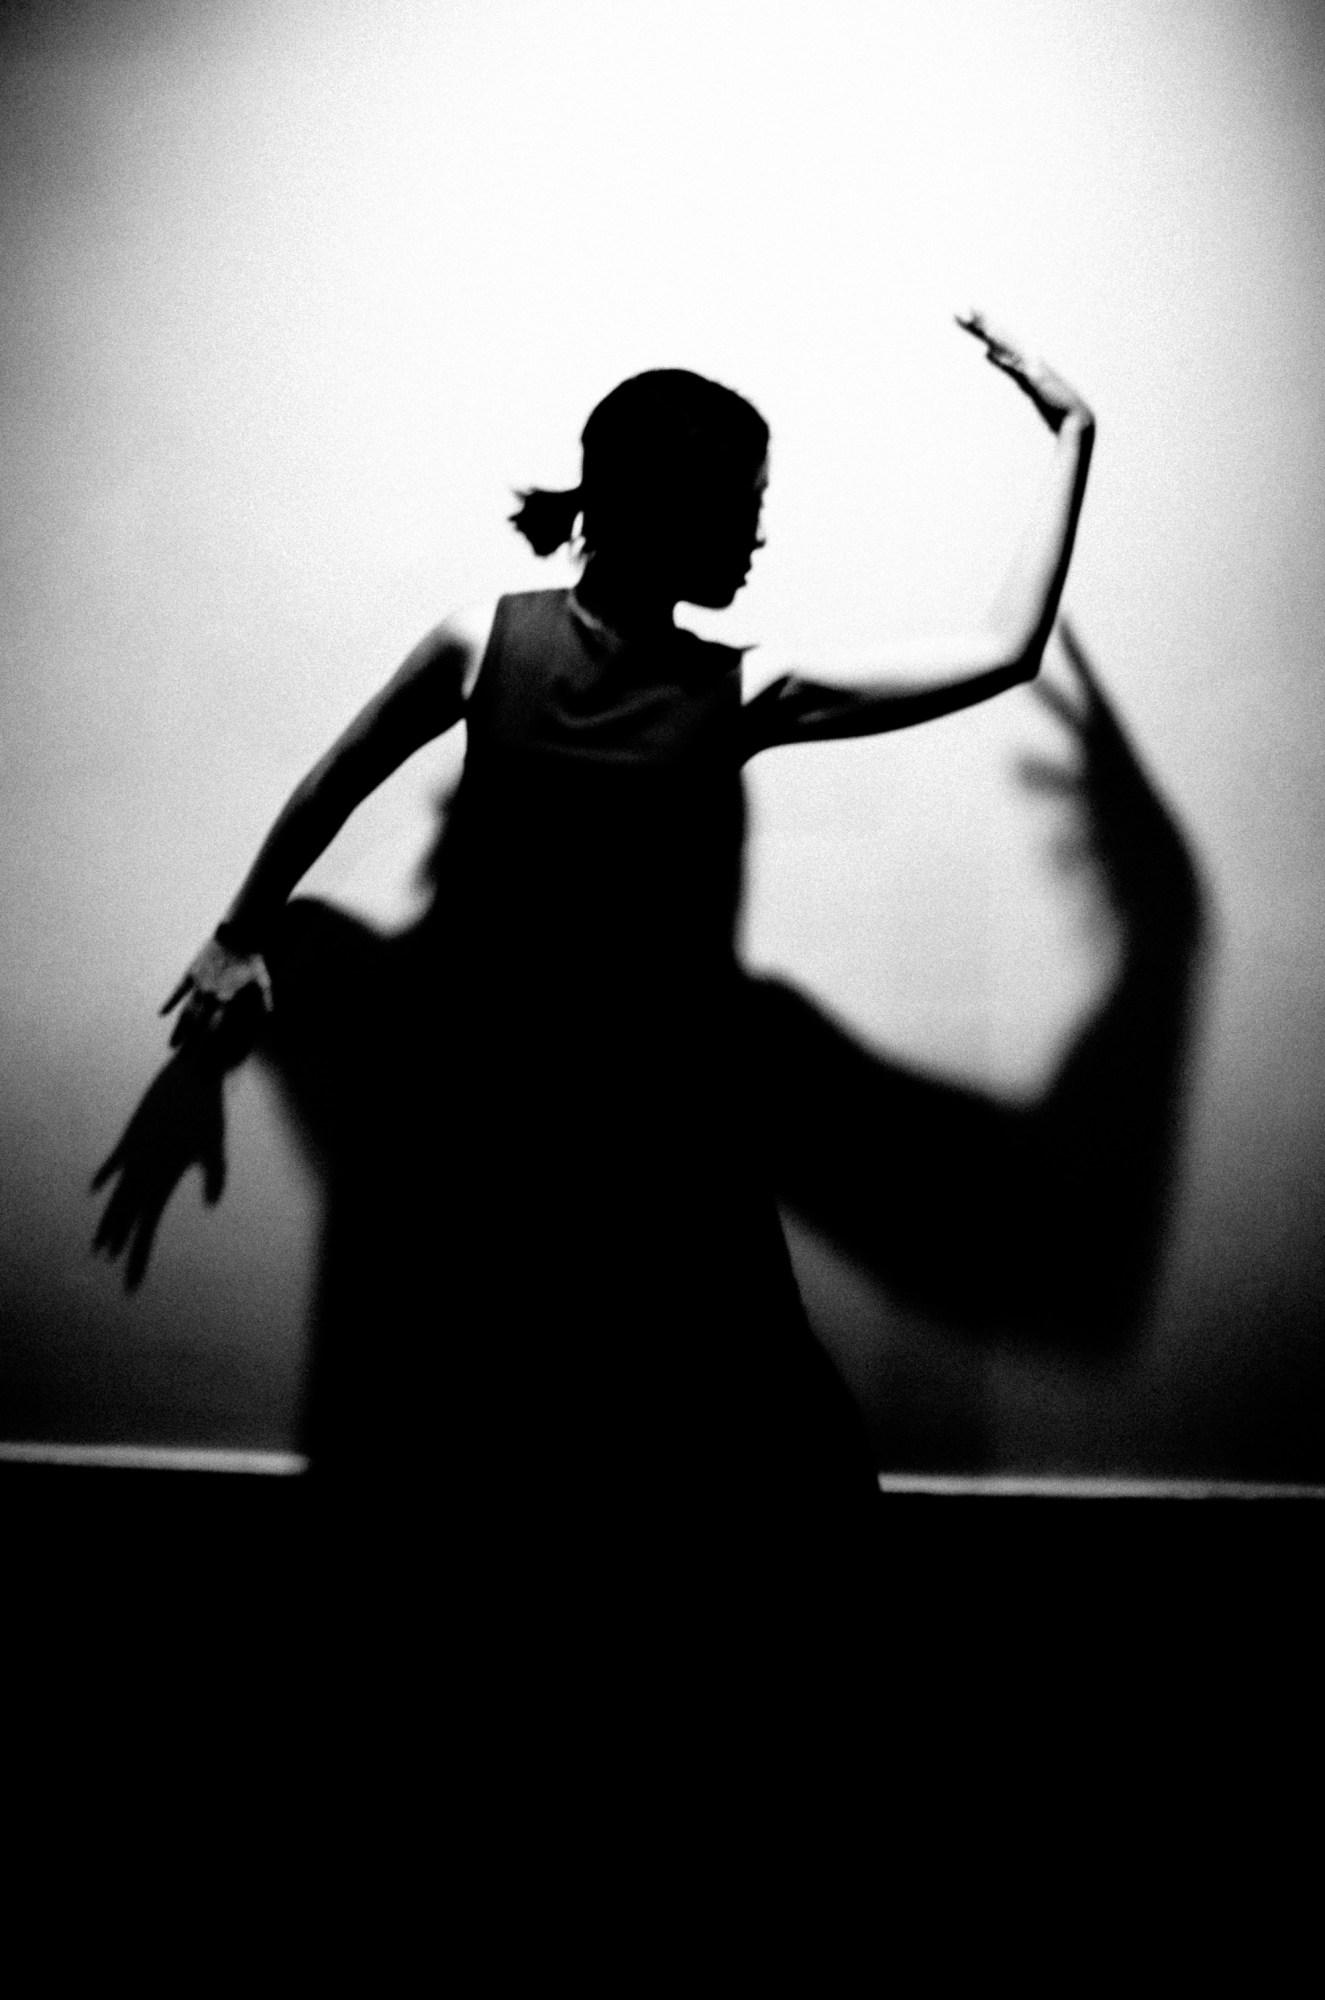 Cindy silhouette and curved arms. Saigon, 2017